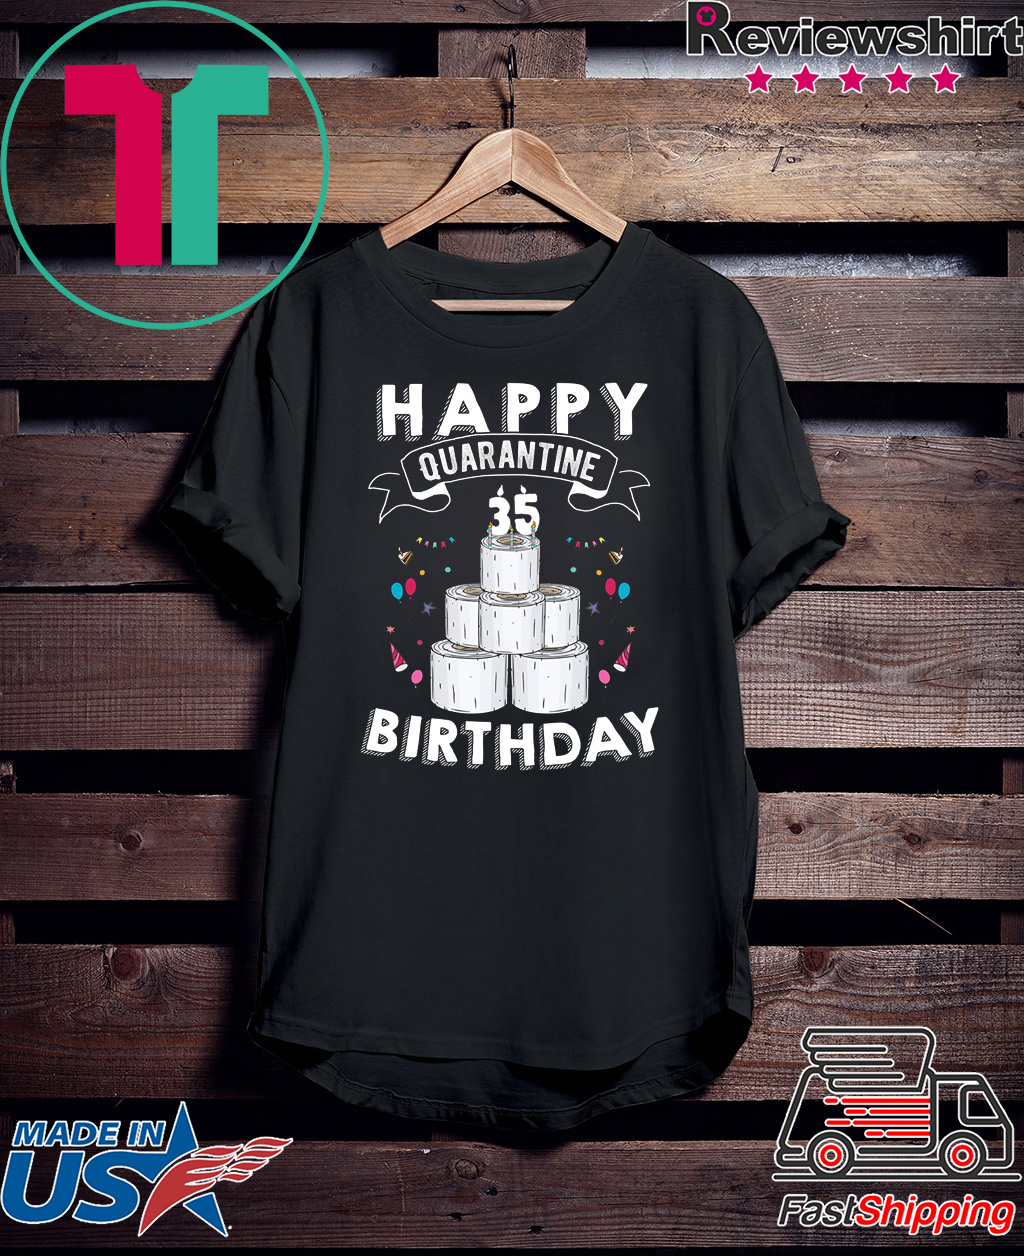 Thirty Five 35th Birthday Gift Themed Women/'s T-Shirt IT TOOK ME 35 YEARS